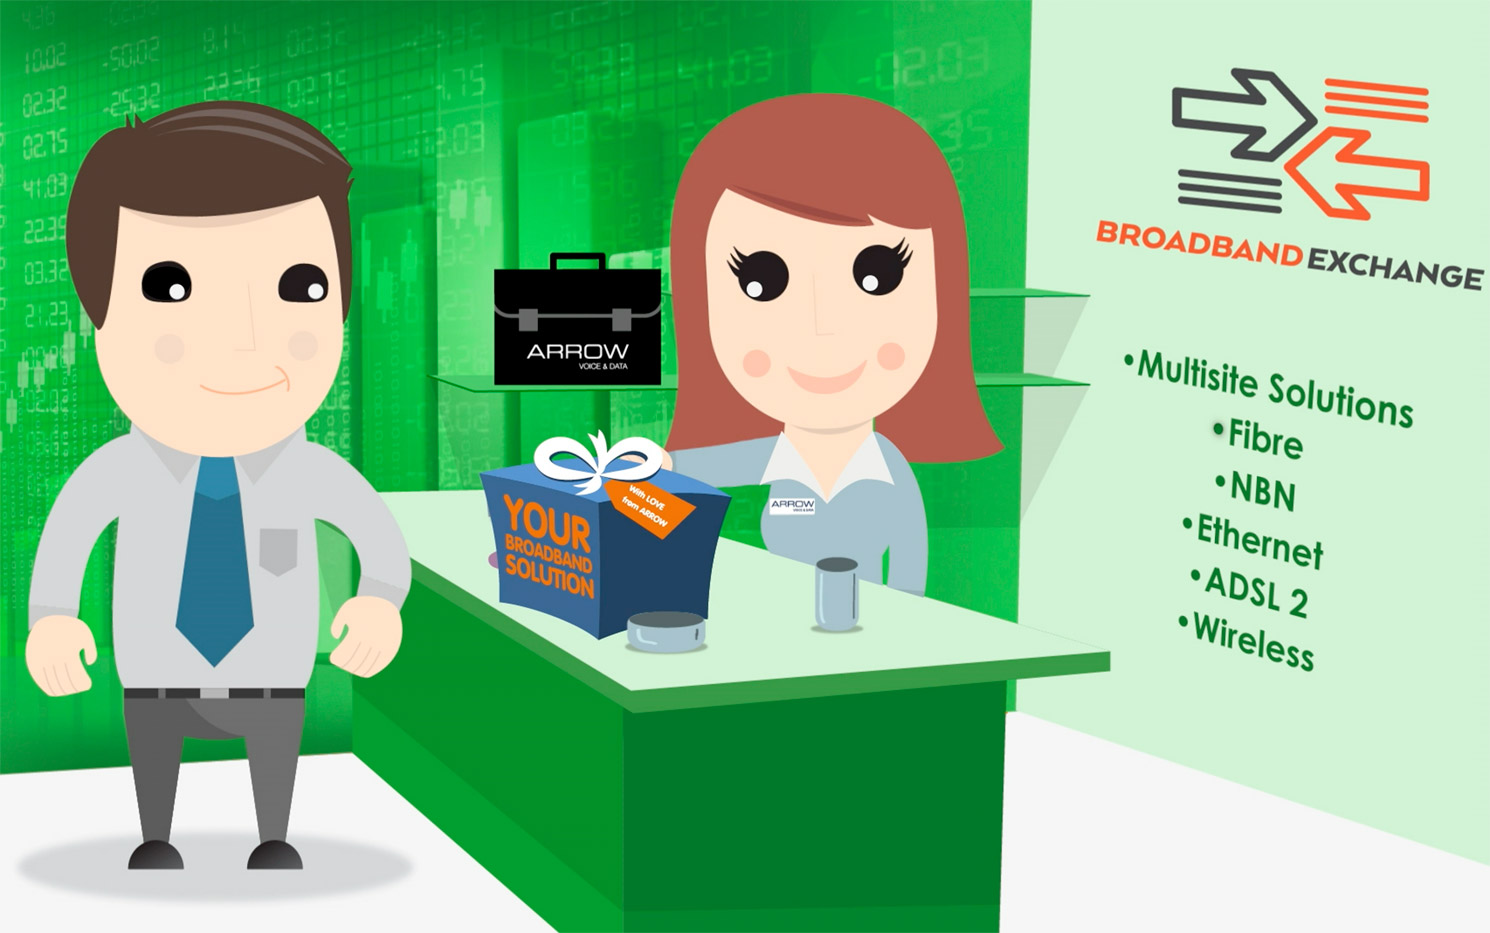 The best broadband business solutions in Australia